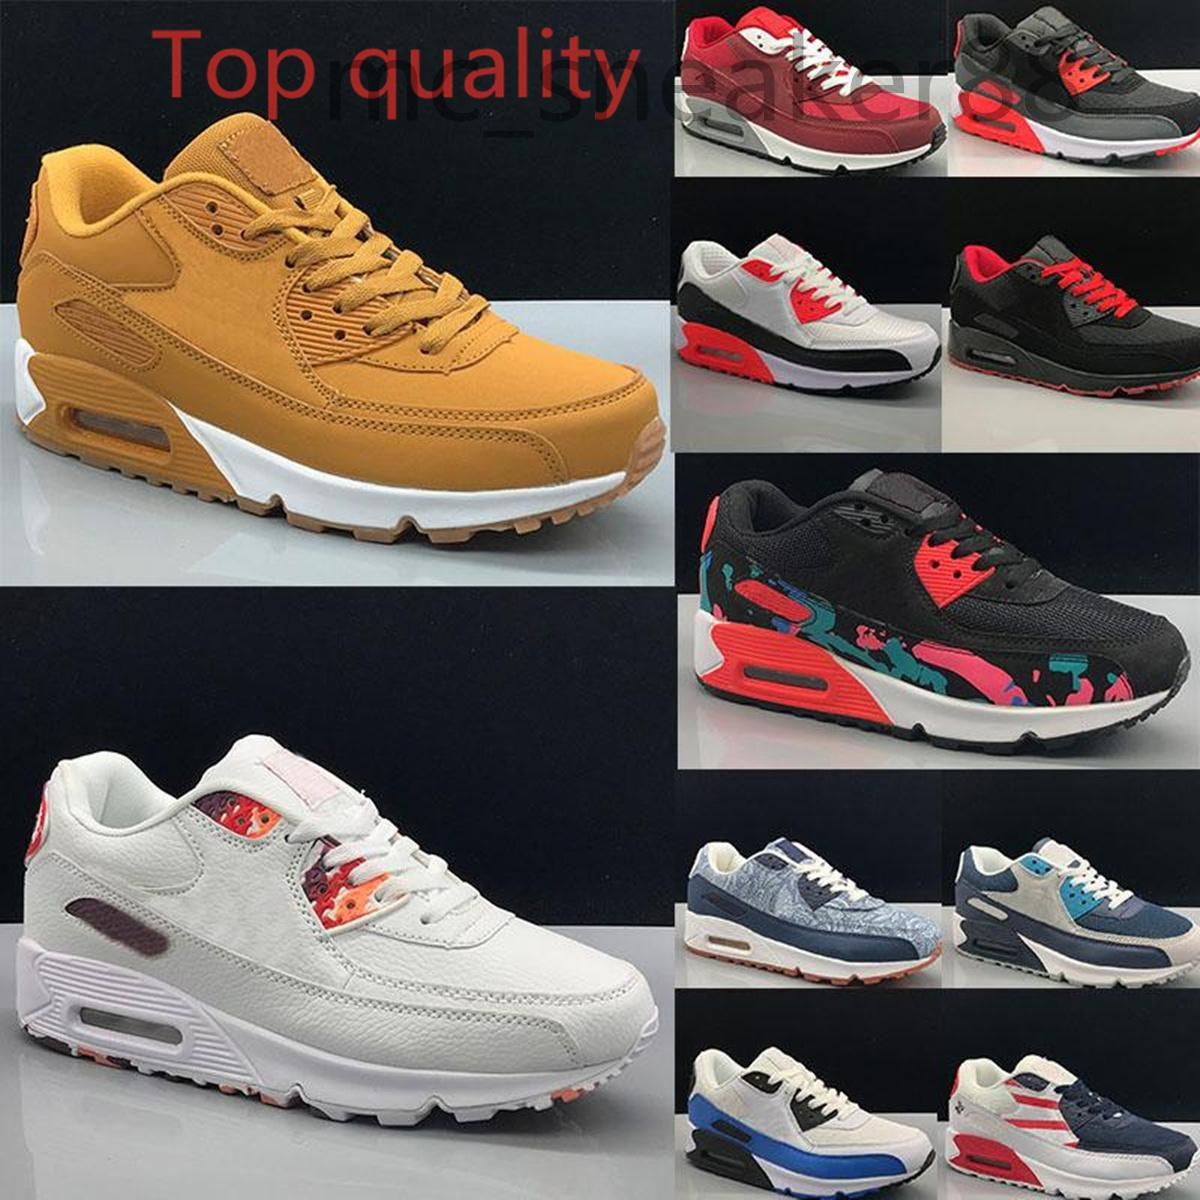 Nike Air Max90 New Classic 90 Herren Casual Schuhe Frauen Designer 90er Jahre Camo Dancefloor Green Triple White Black Infrarot Grau Trainer Sport Outdoor Sneakers